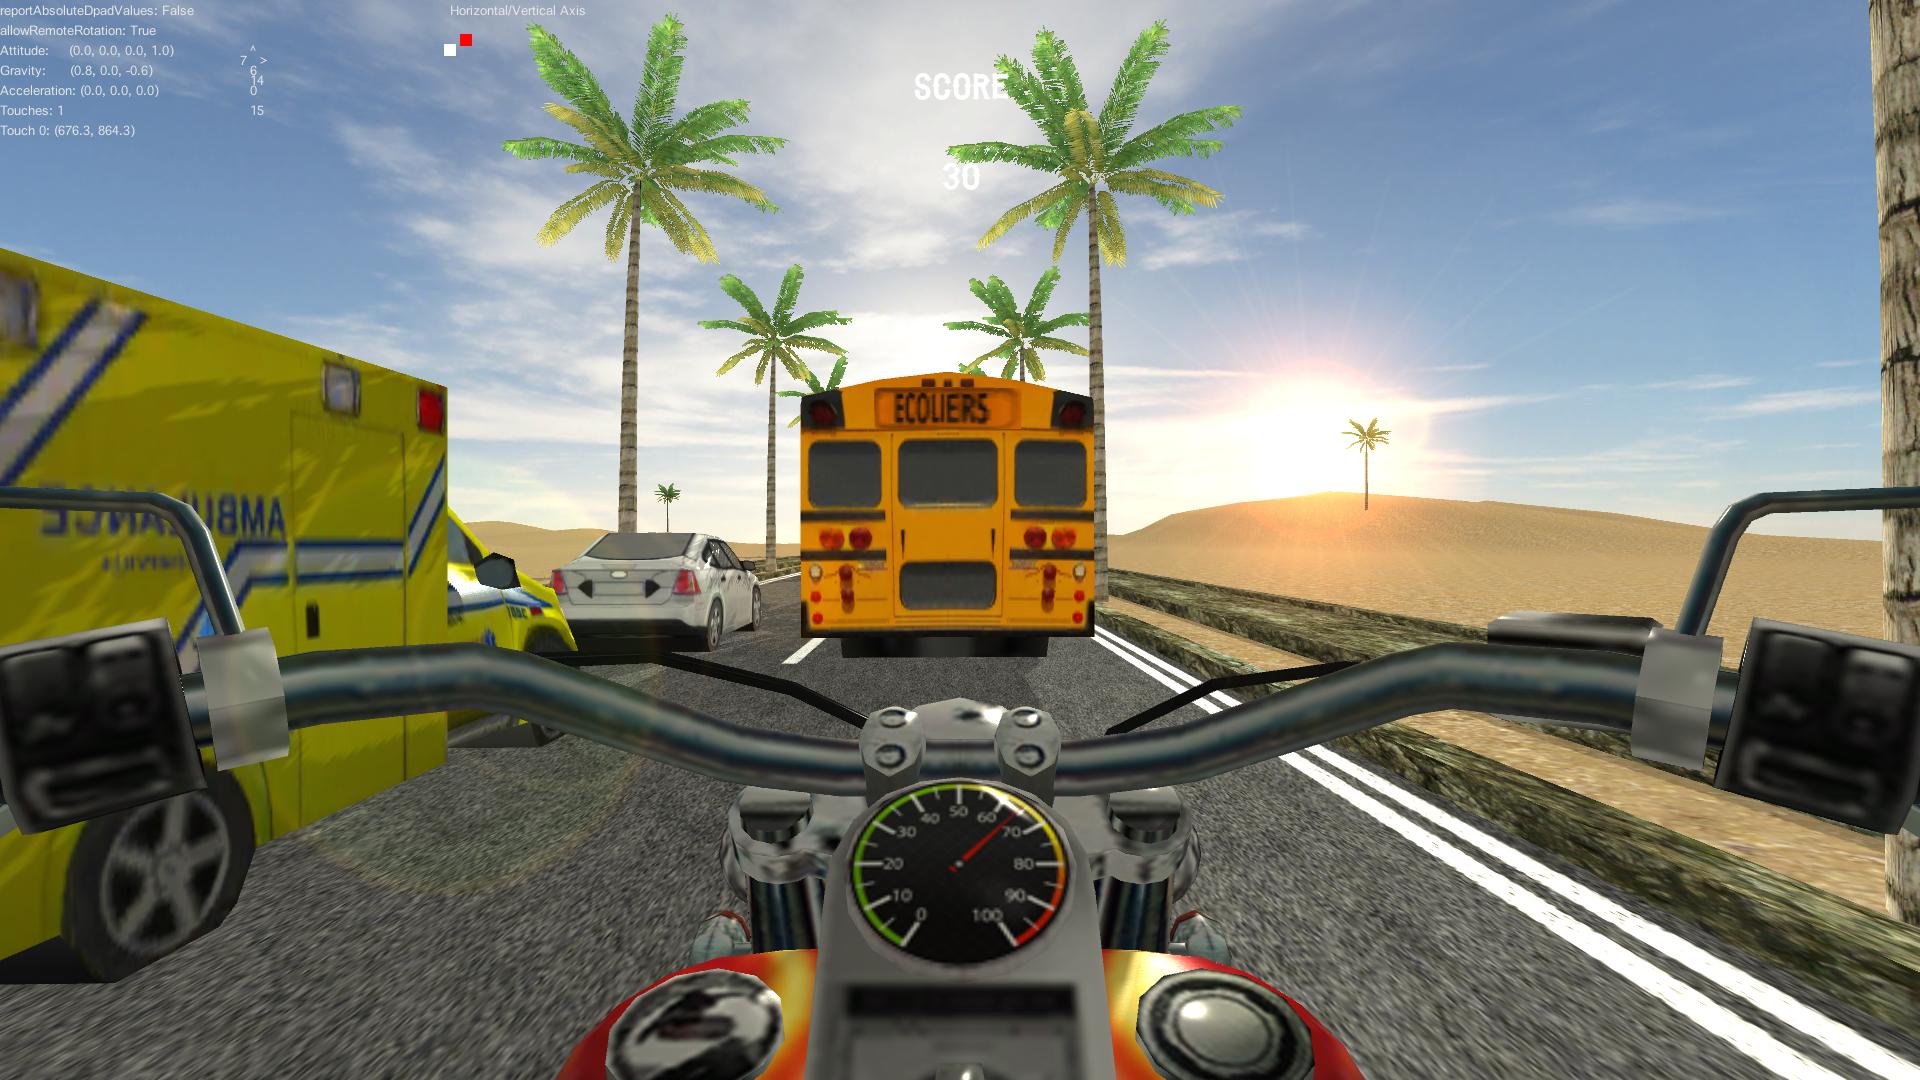 Biker Run screenshot 1